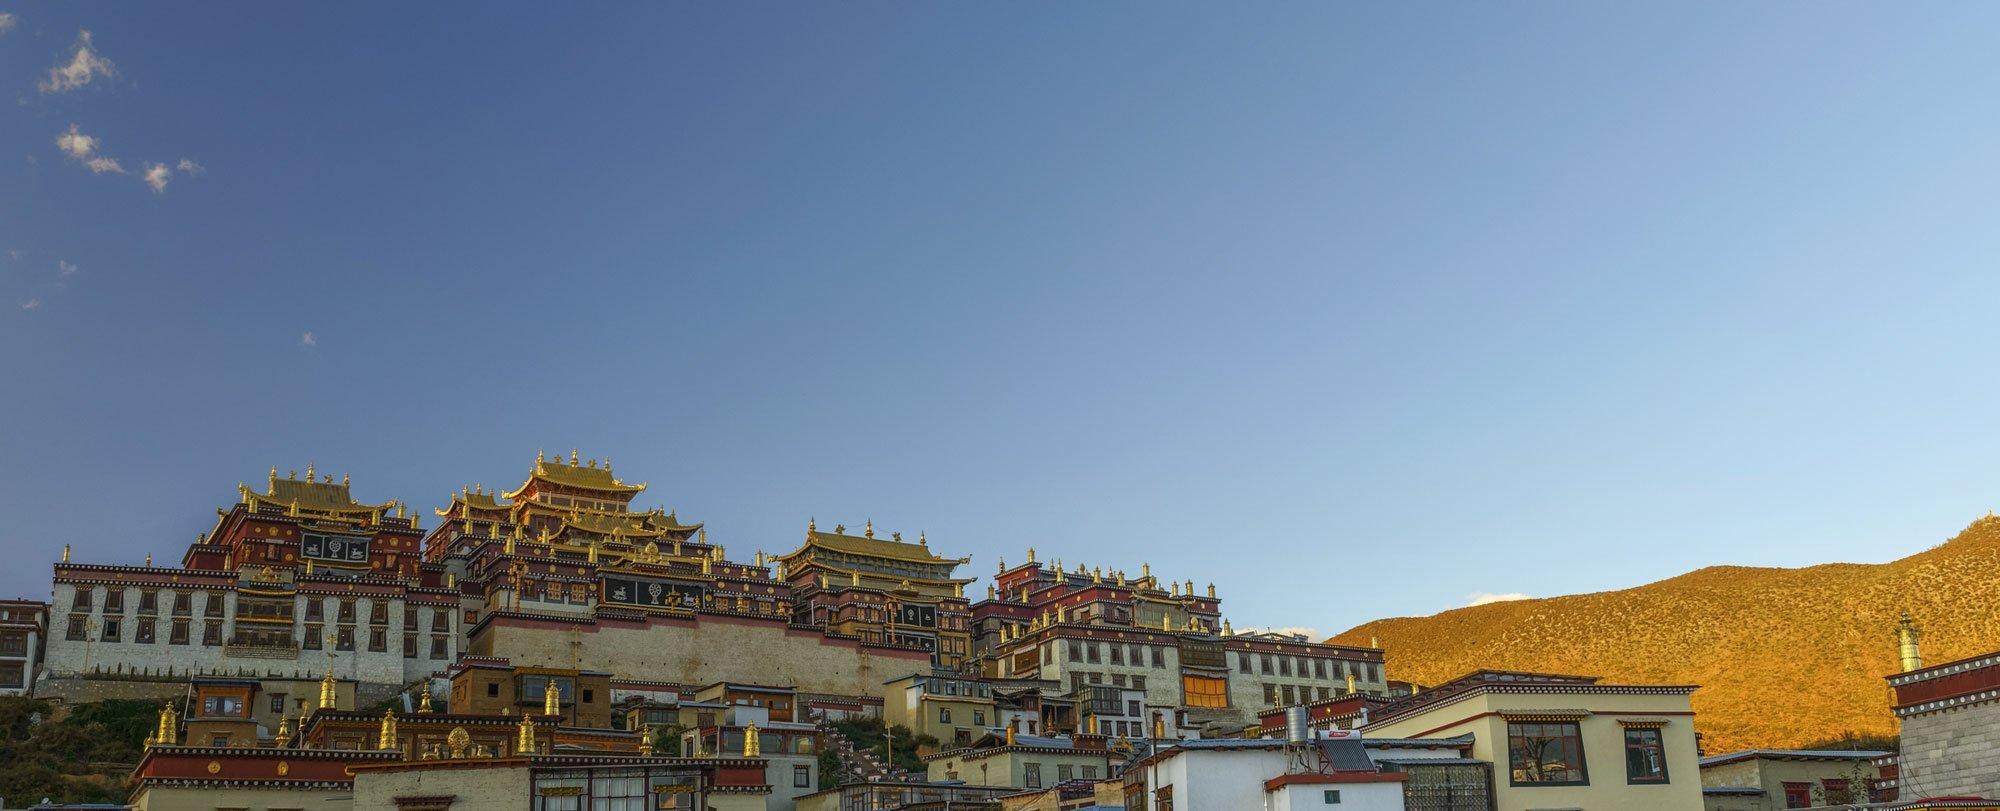 buddhist temple 104396618